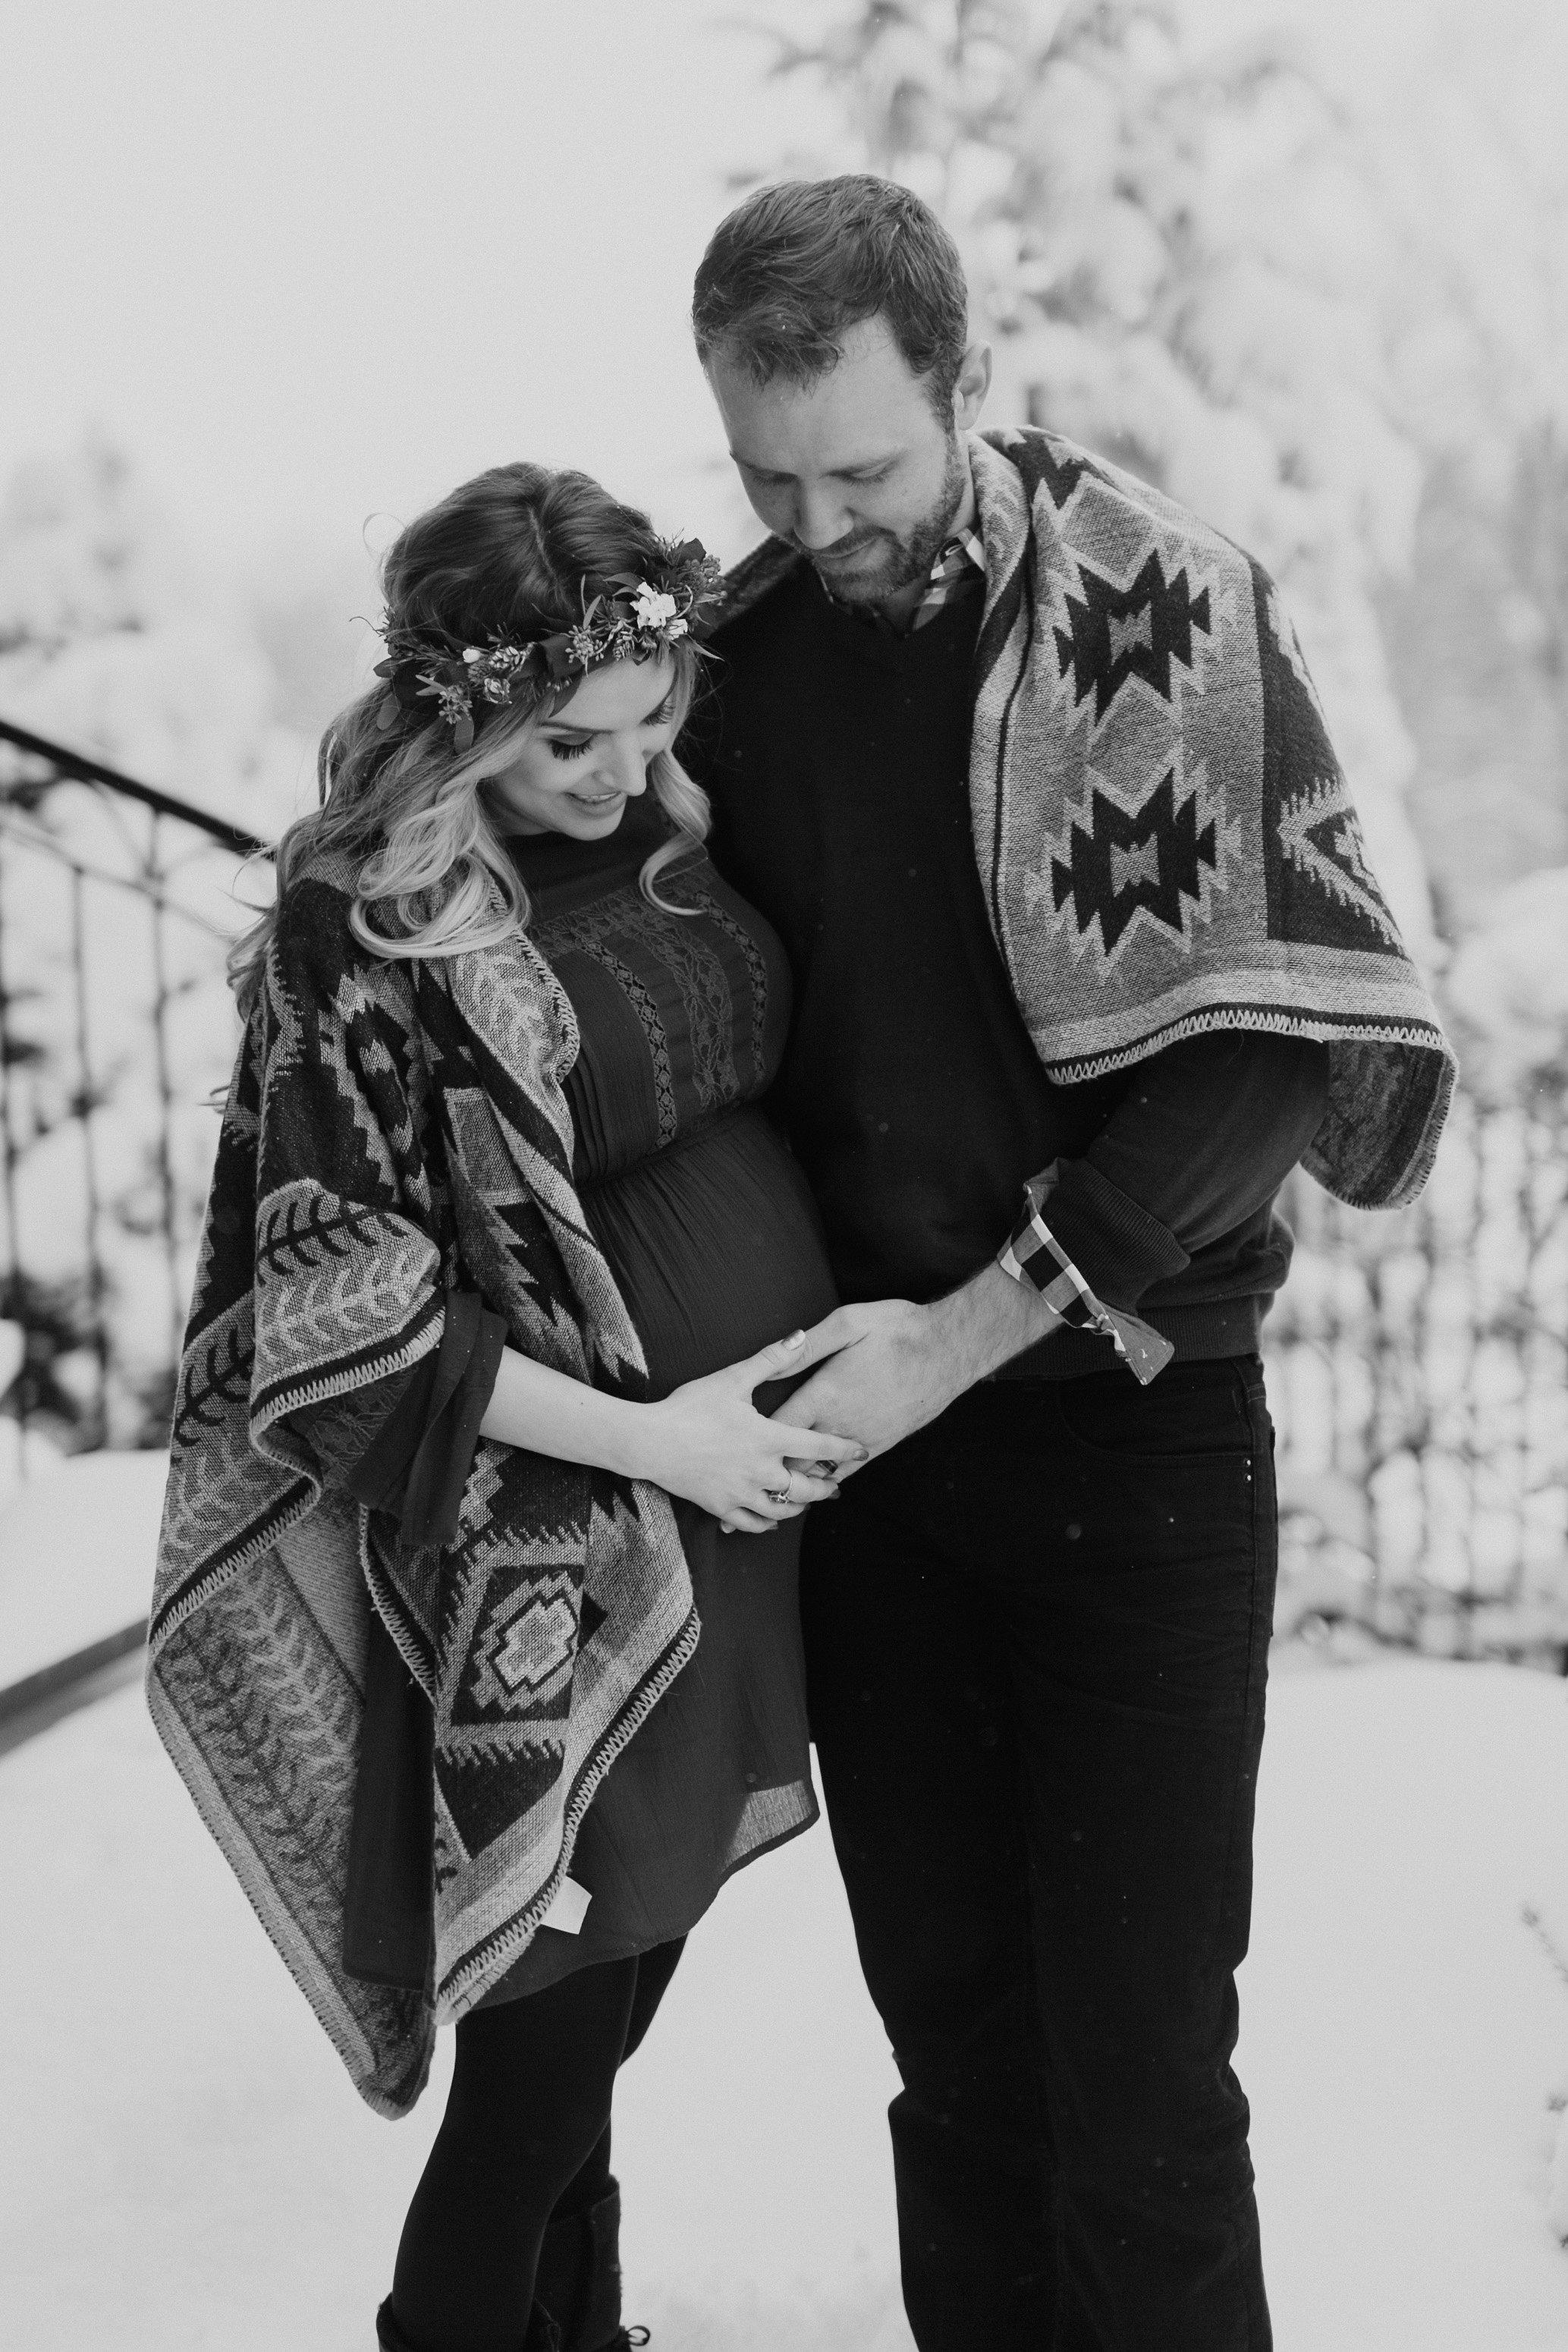 MATERNITY PHOTOS | A Cozy, Home Maternity Session Kingdom Photography - London, Ontario